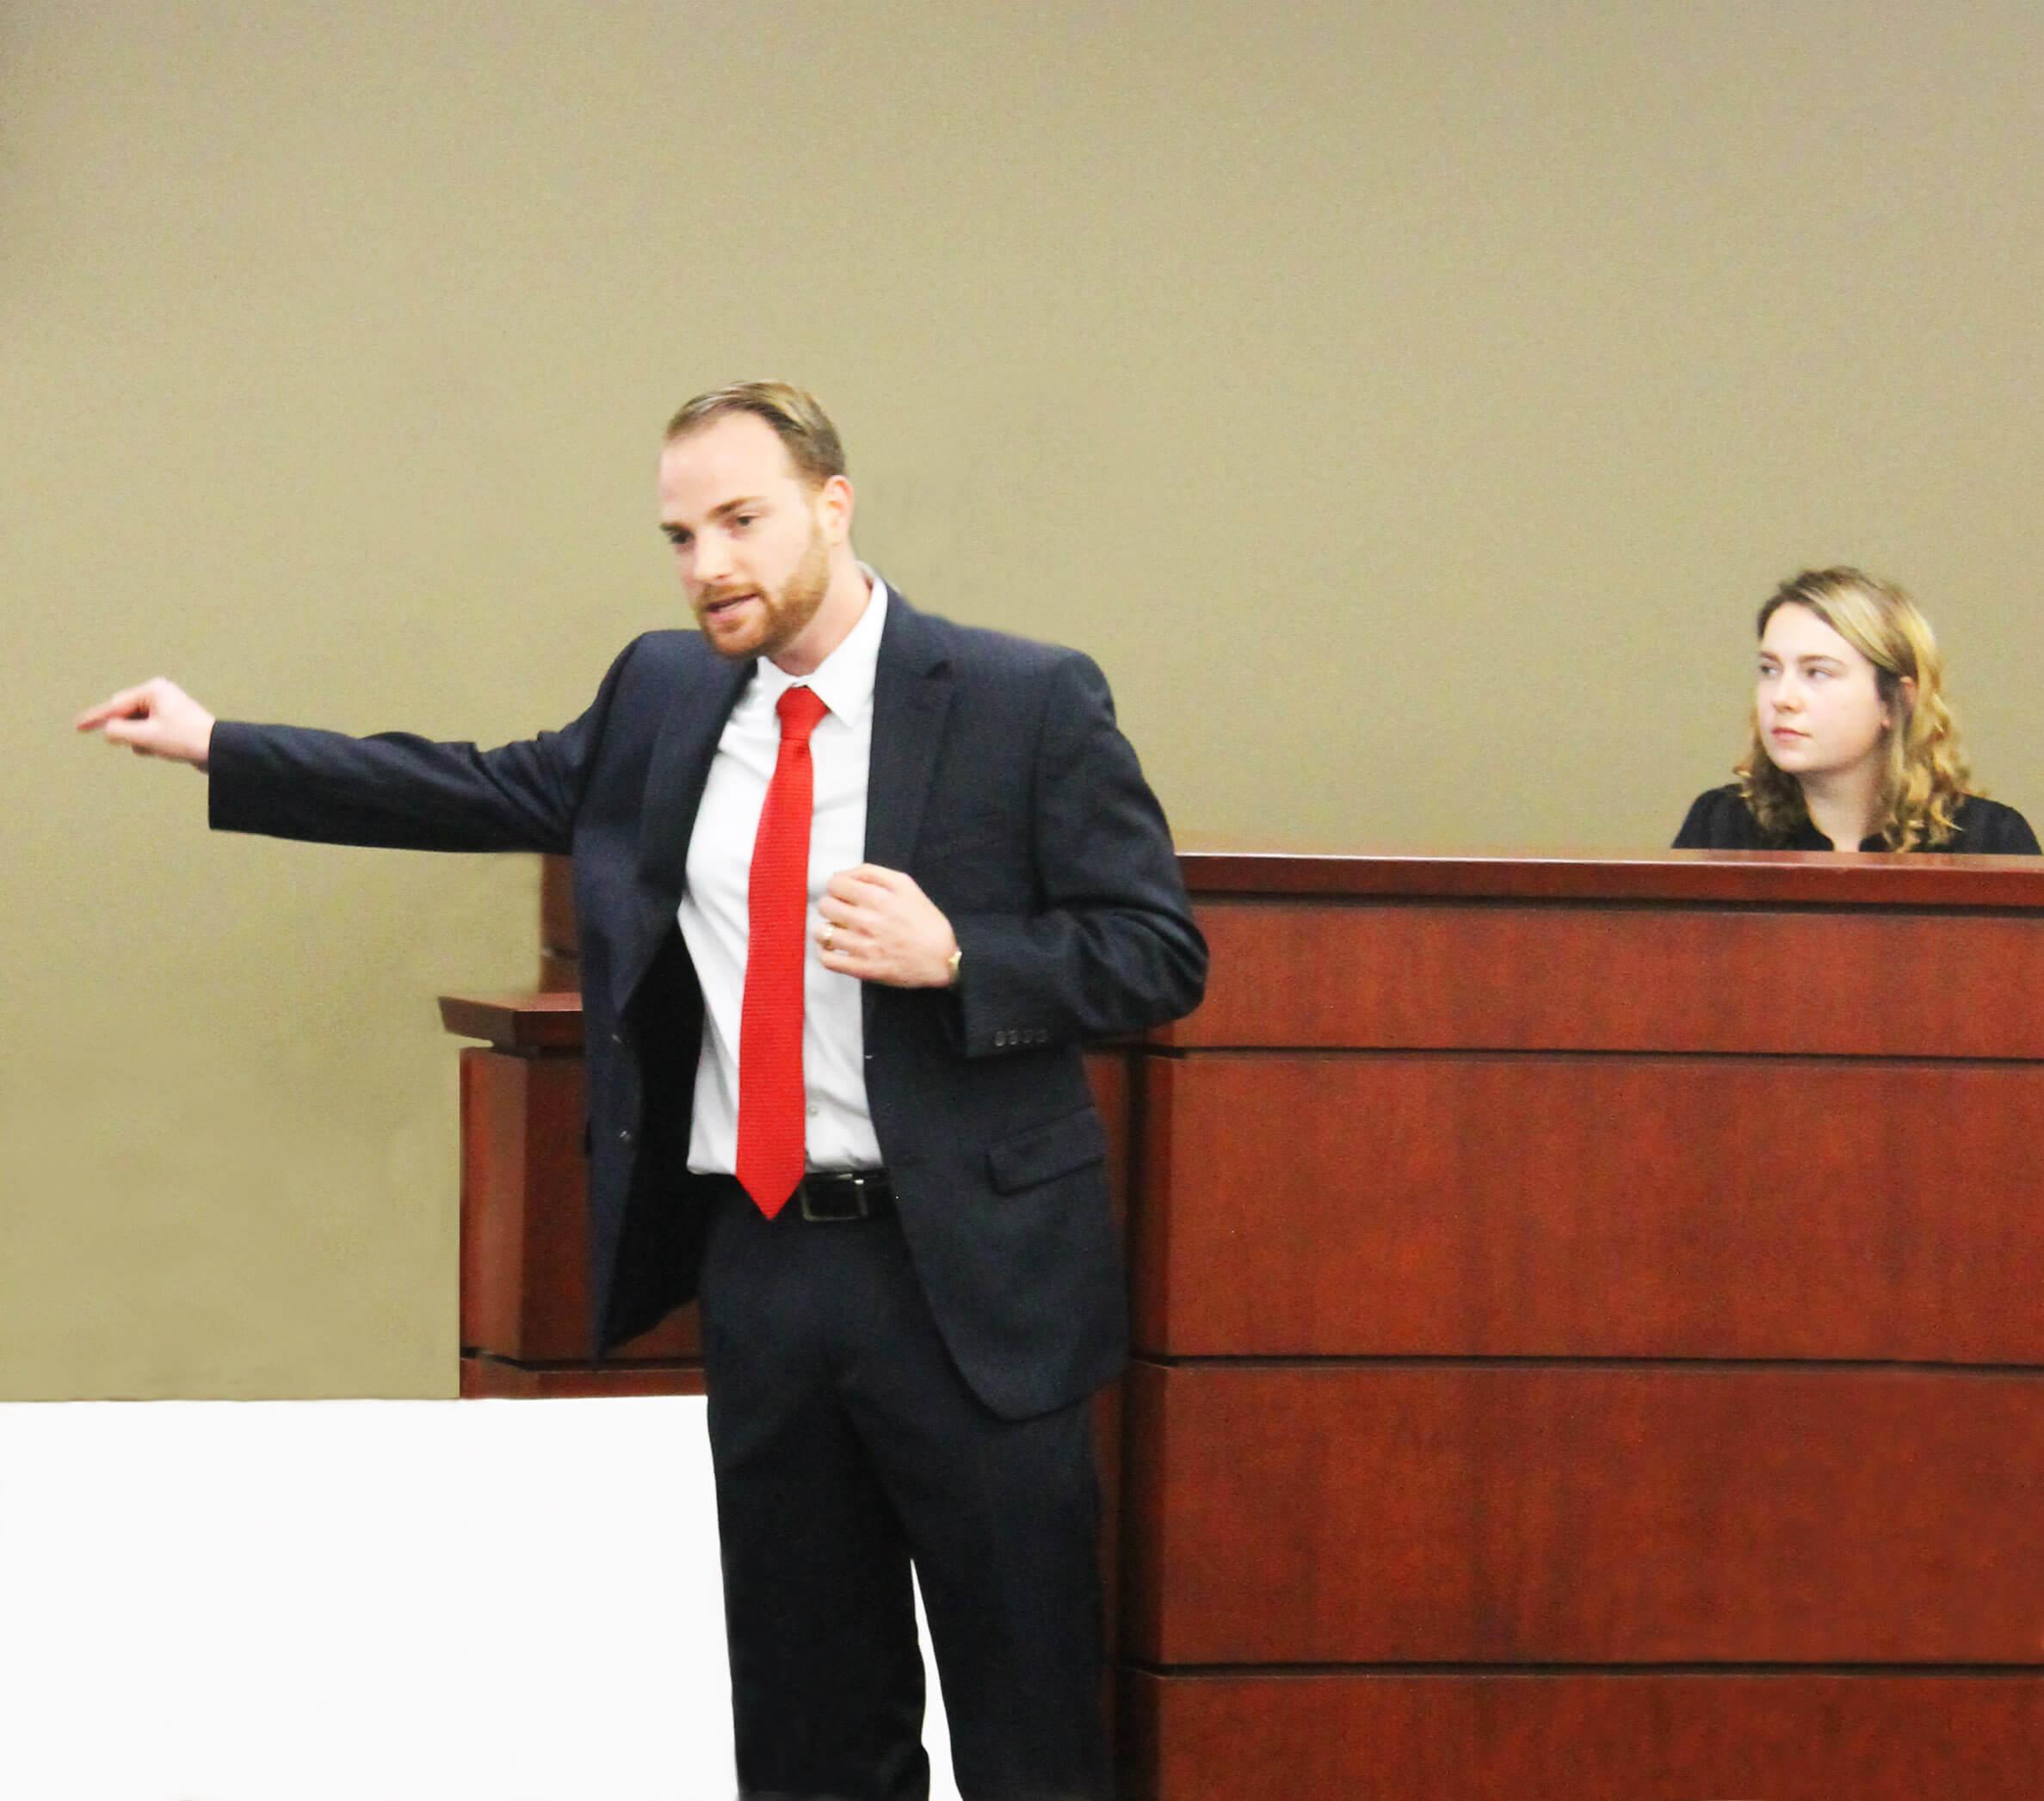 Man presenting evidence